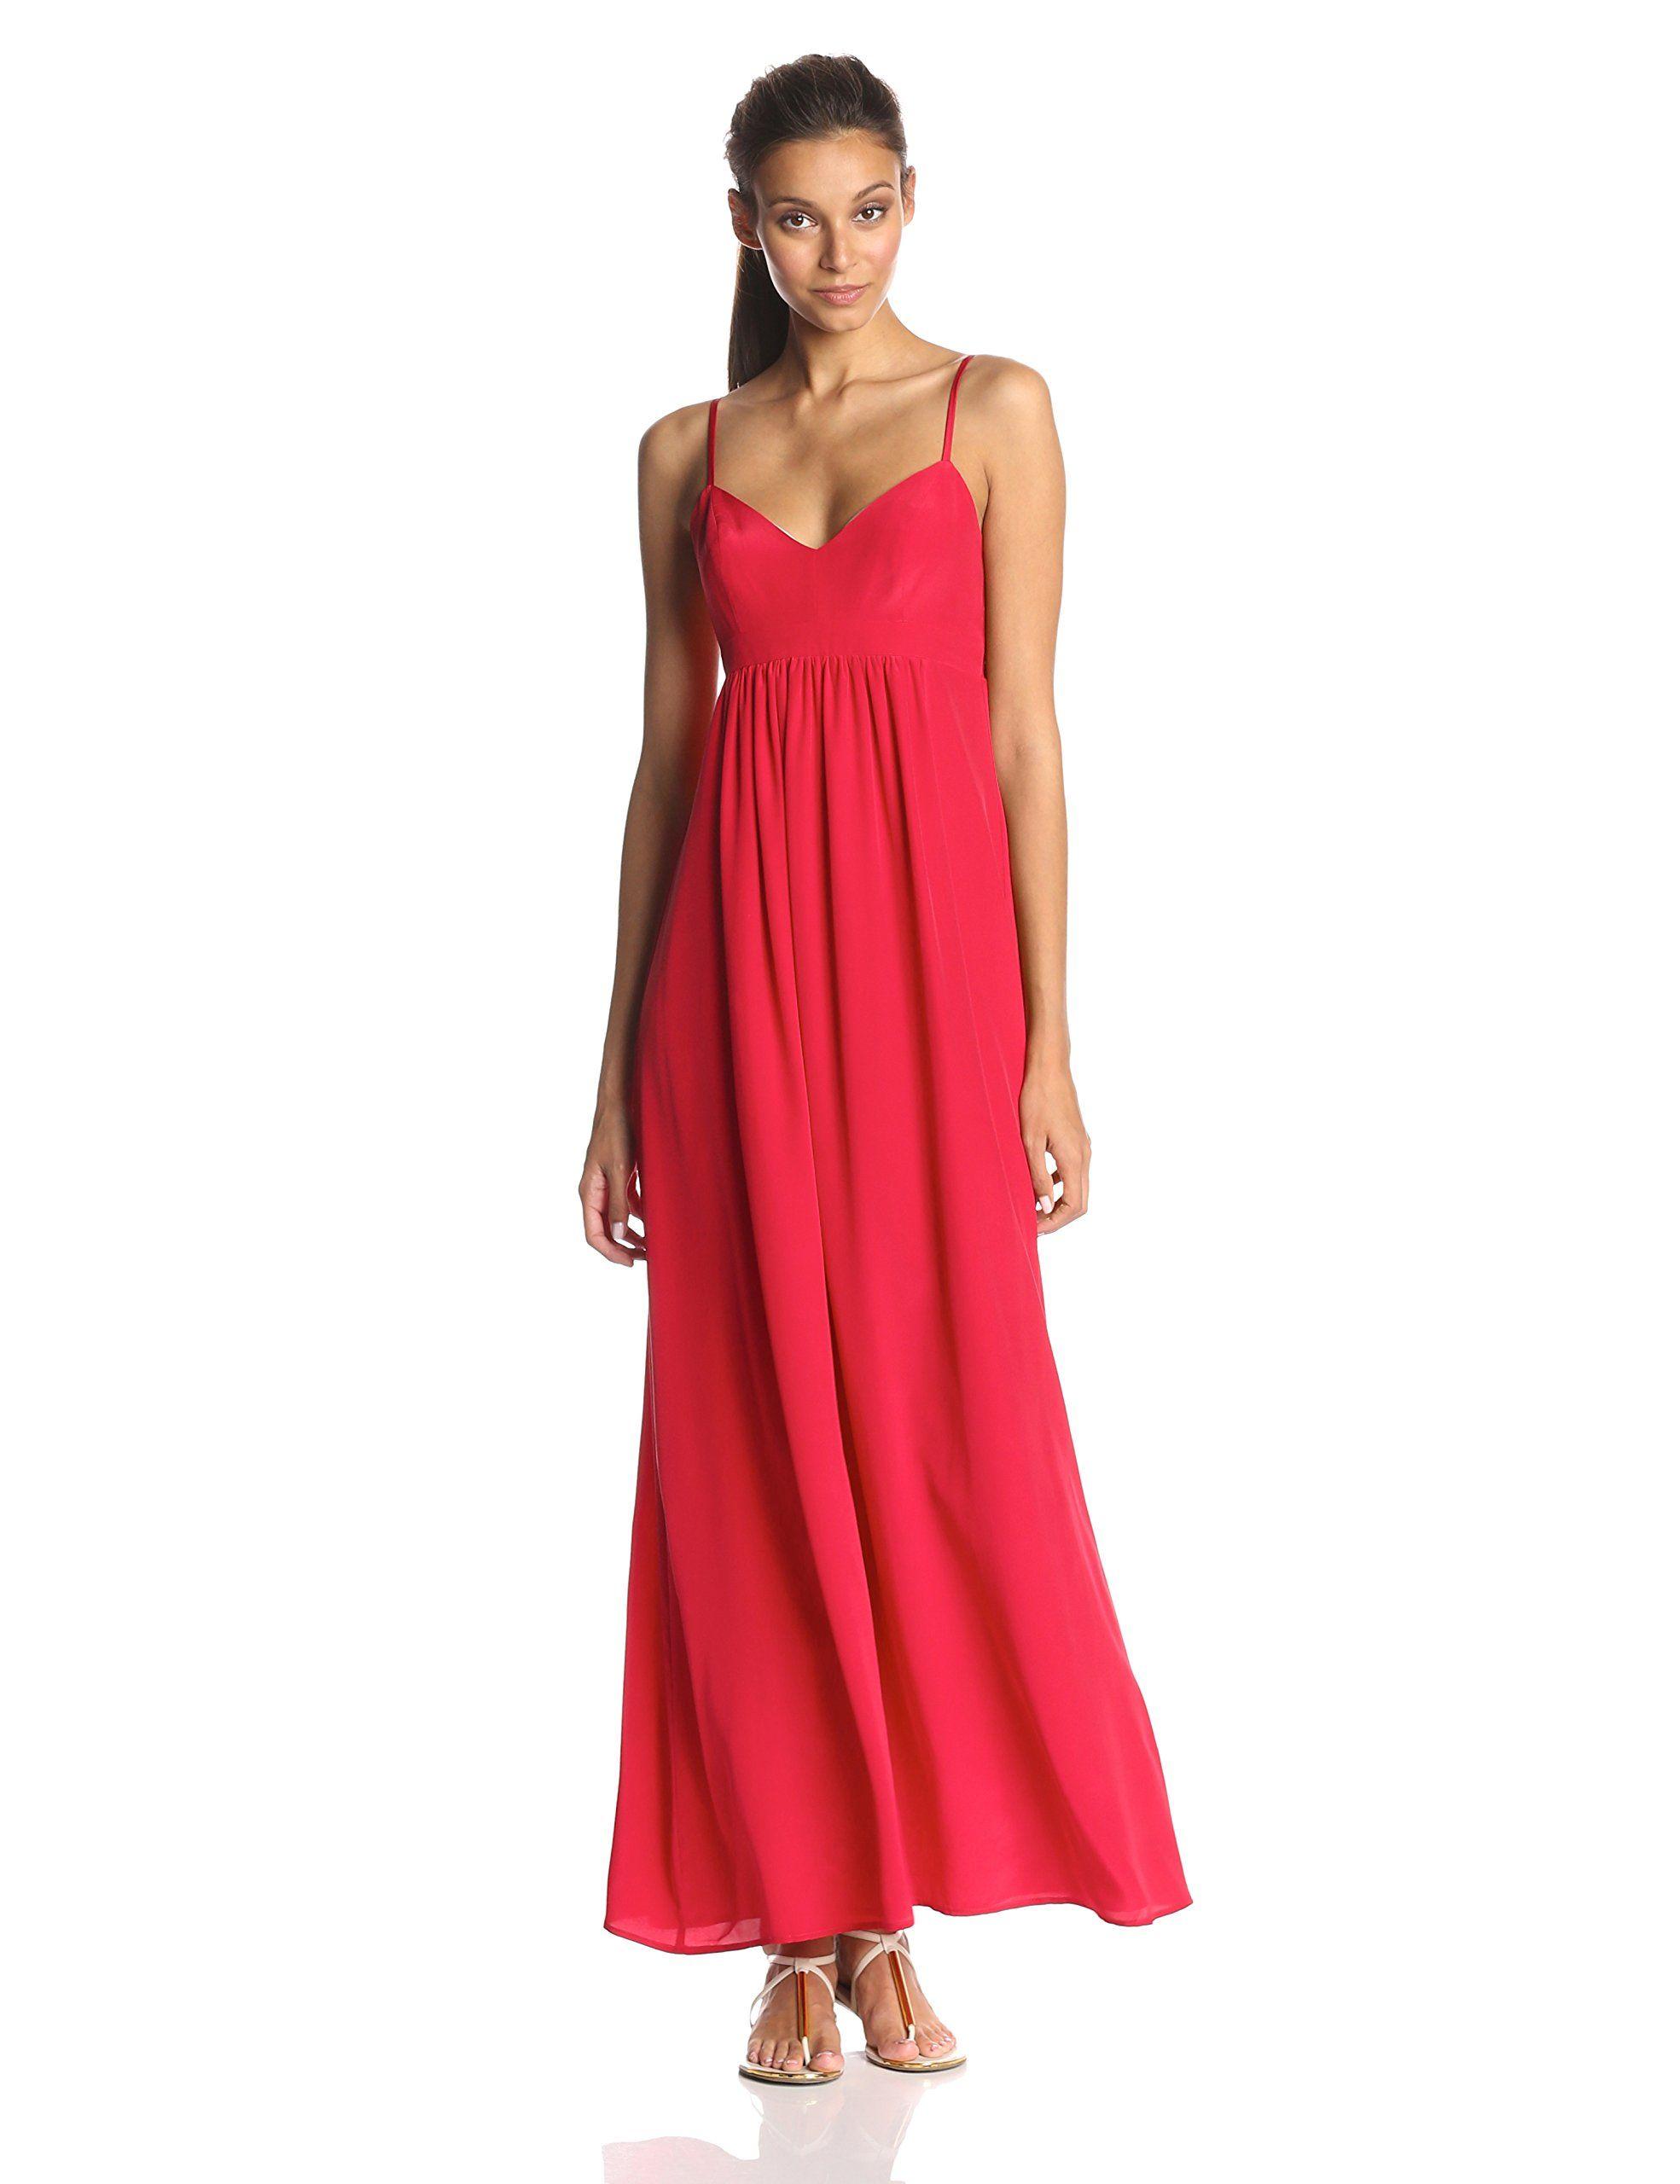 The dress! | #SWATStyle: Bauble Babes | Pinterest | Amanda uprichard ...